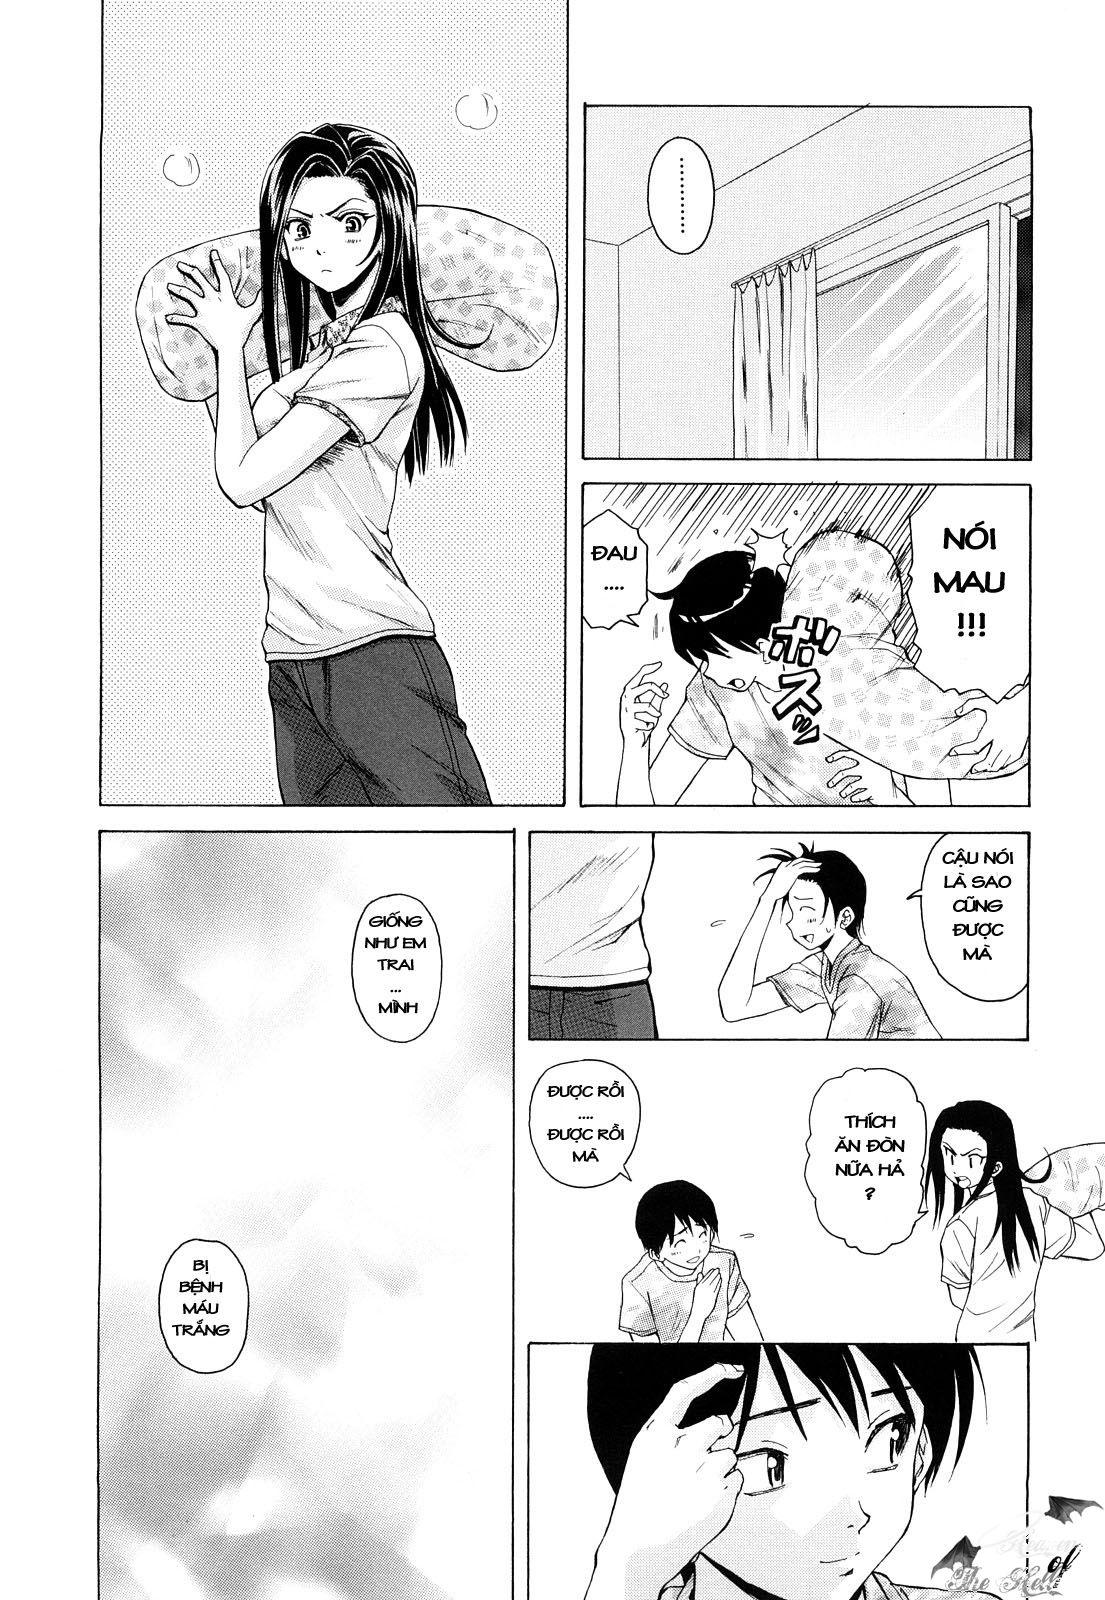 TruyenHay.Com - Ảnh 5 - Setsunai Omoi Chapter 4